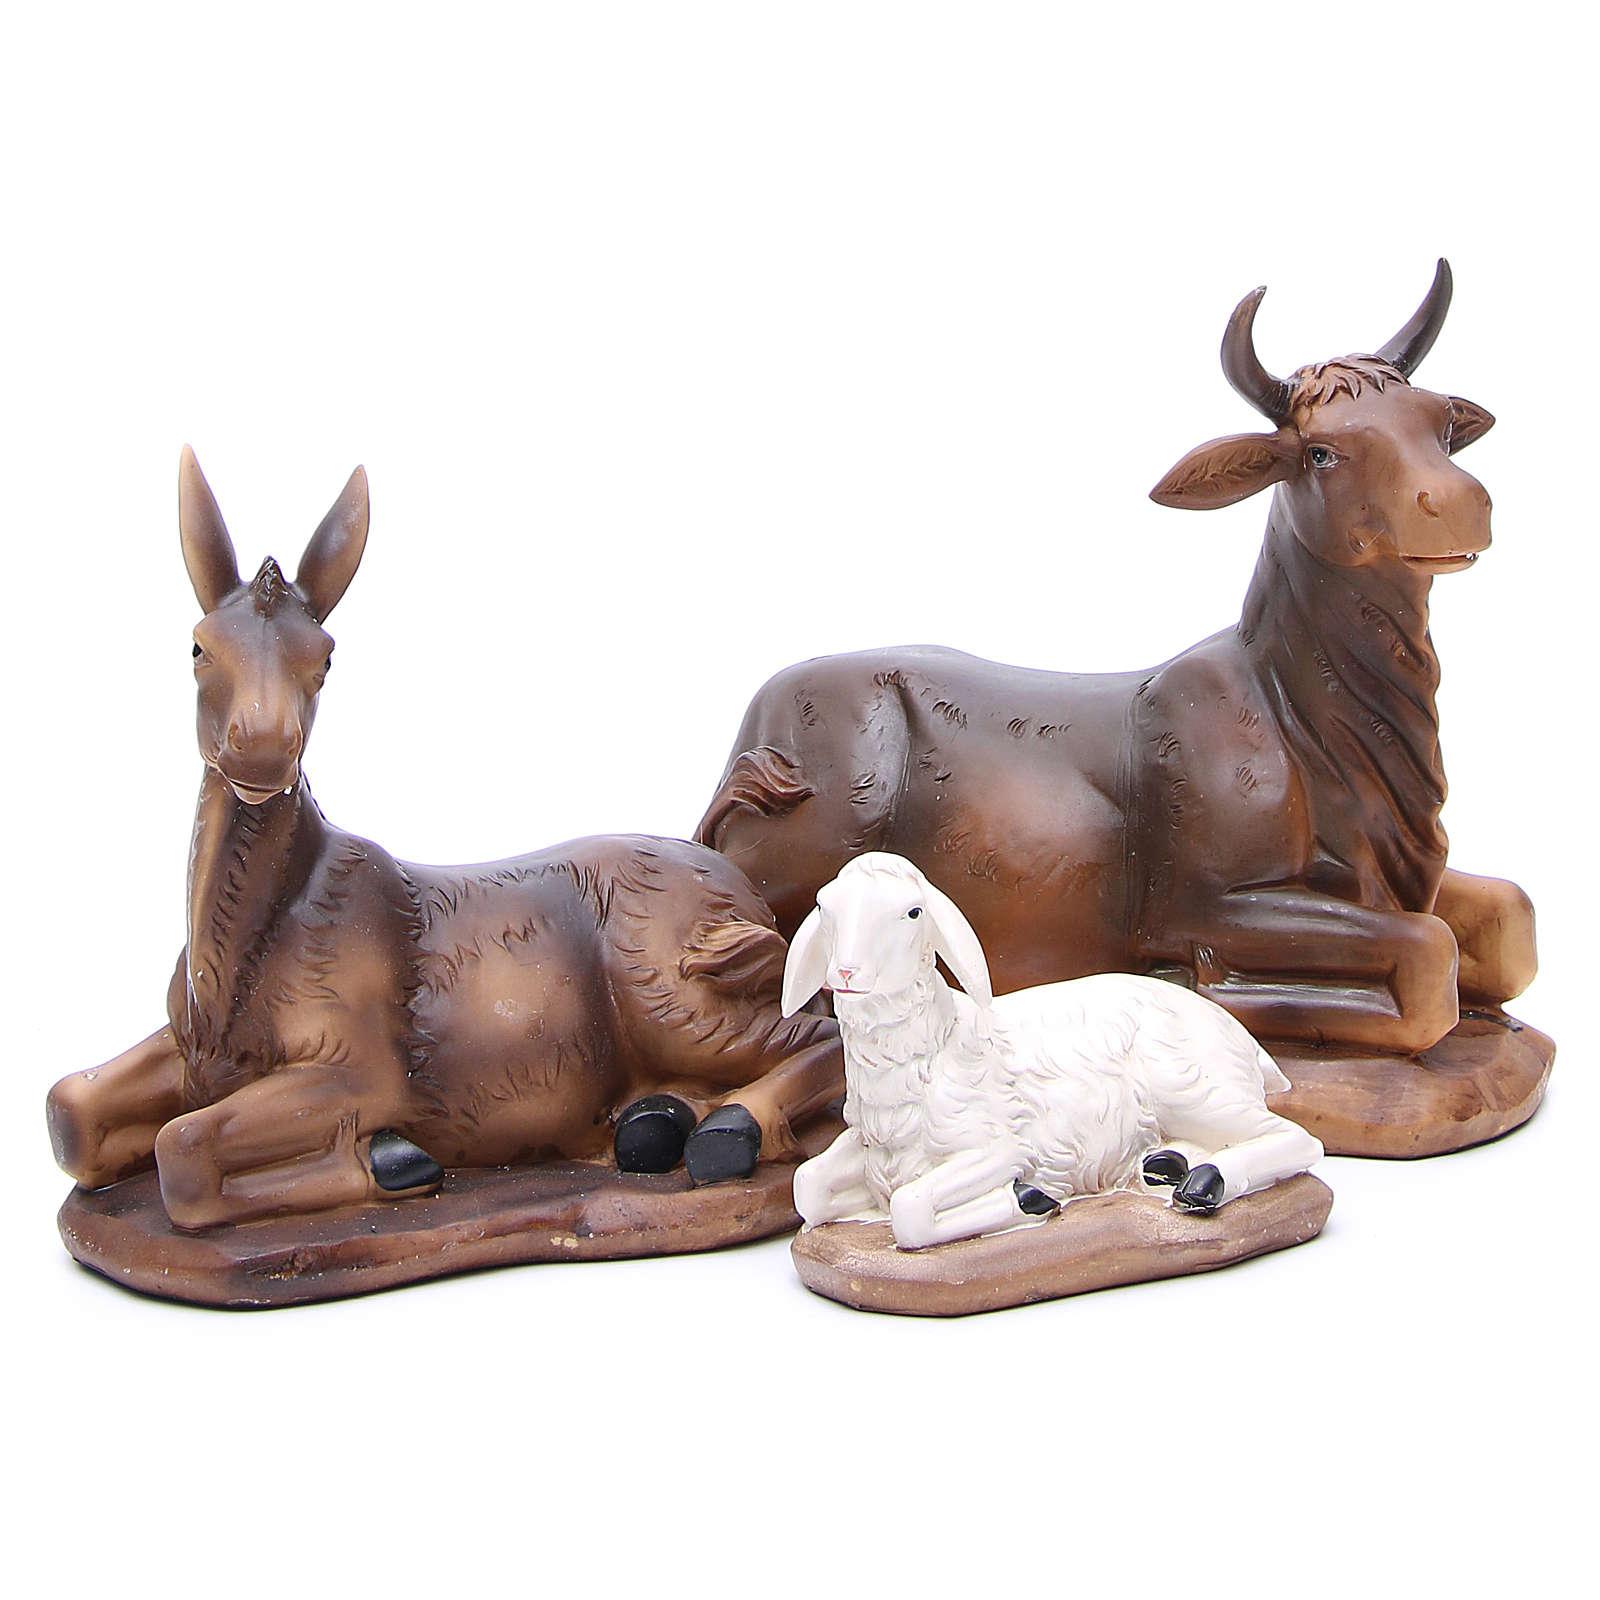 Presepe resina 43 cm set 11 pezzi tipo legno 4